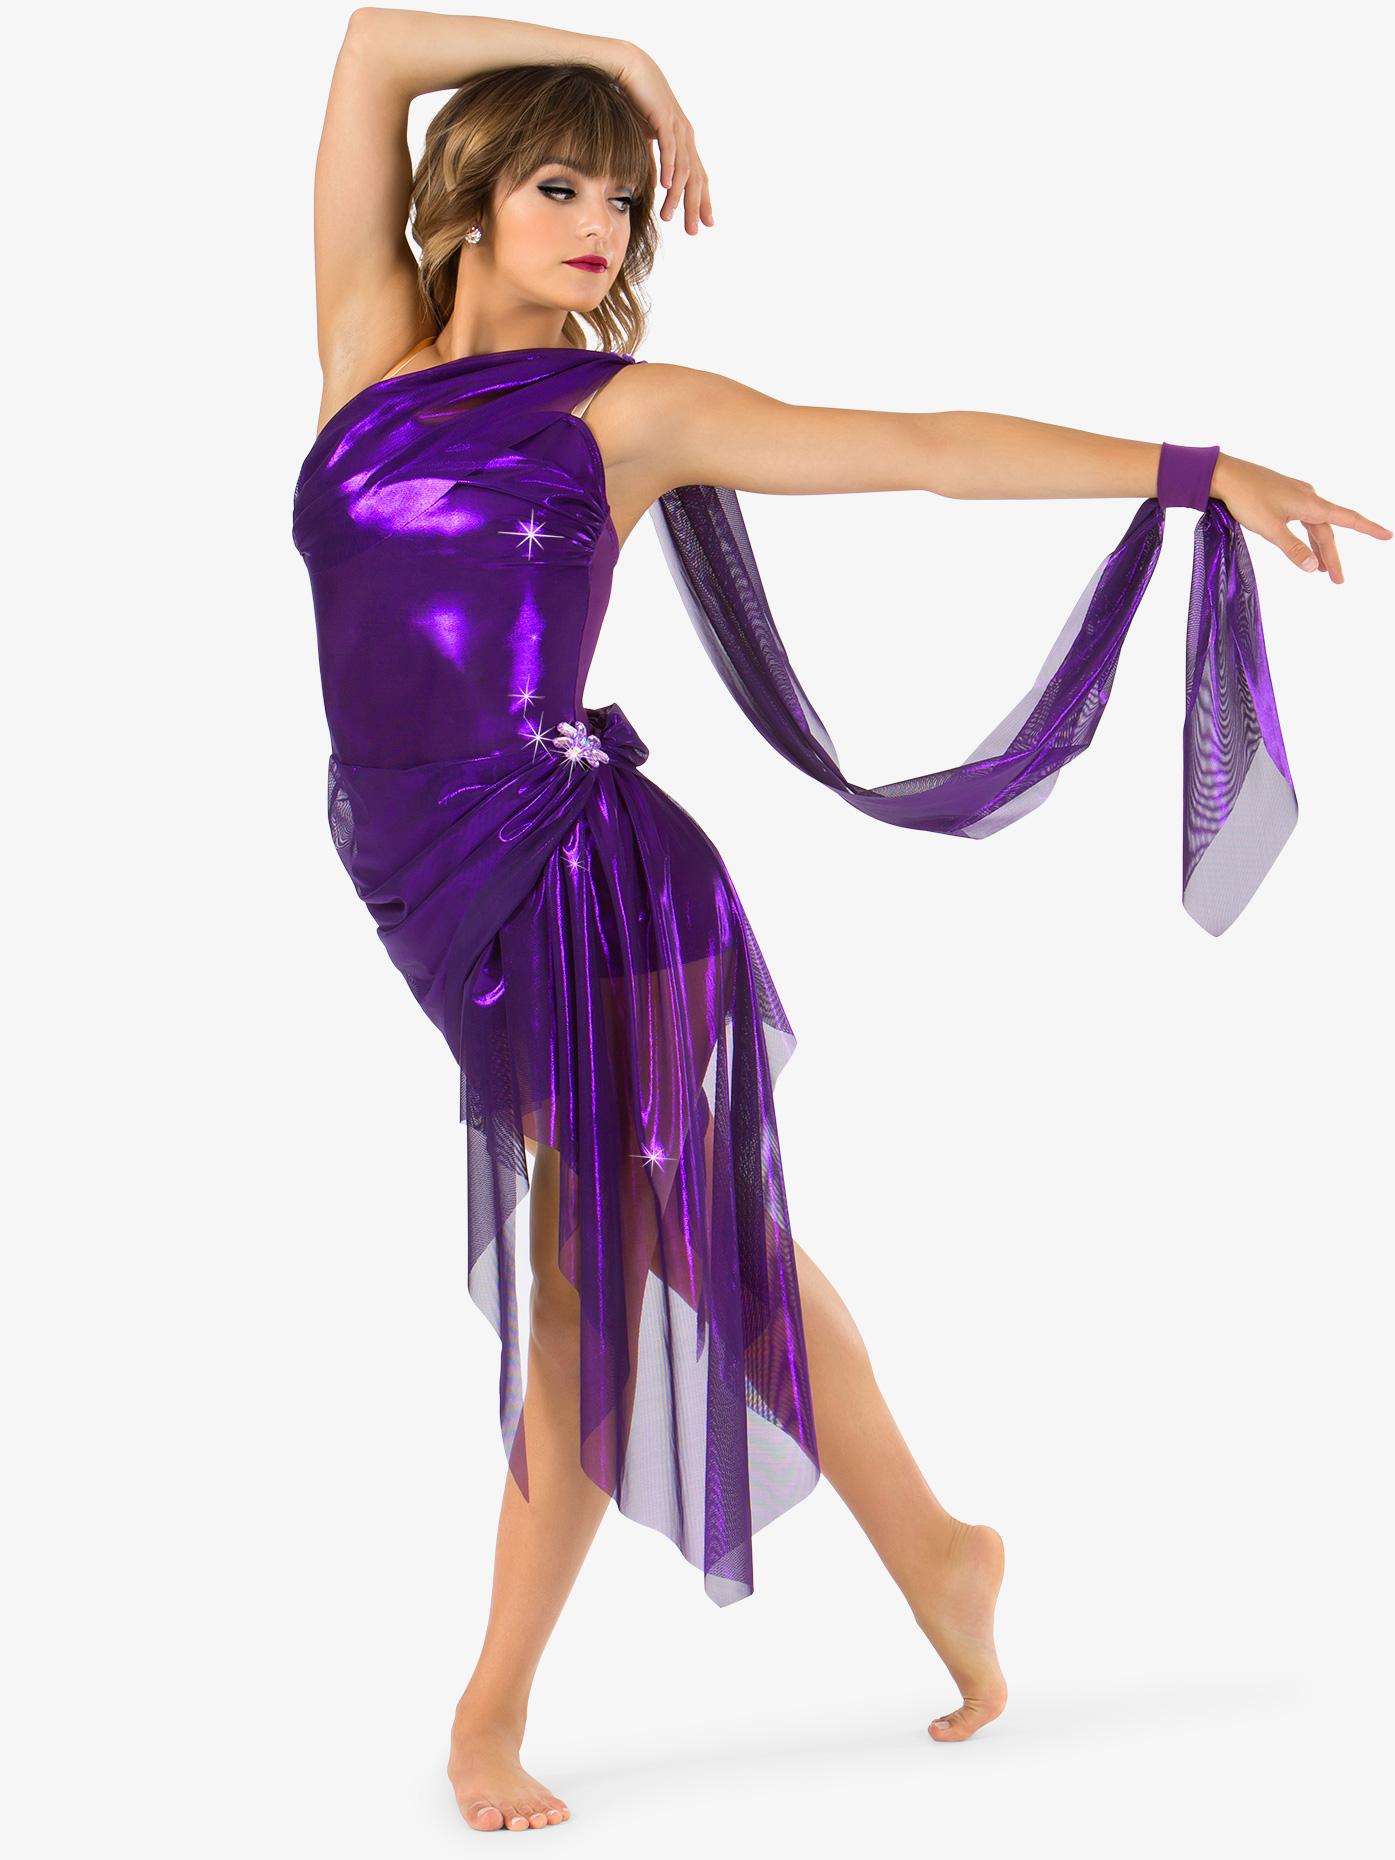 Elisse by Double Platinum Womens Glitter Mesh Bustled Performance Shorty Unitard N7470